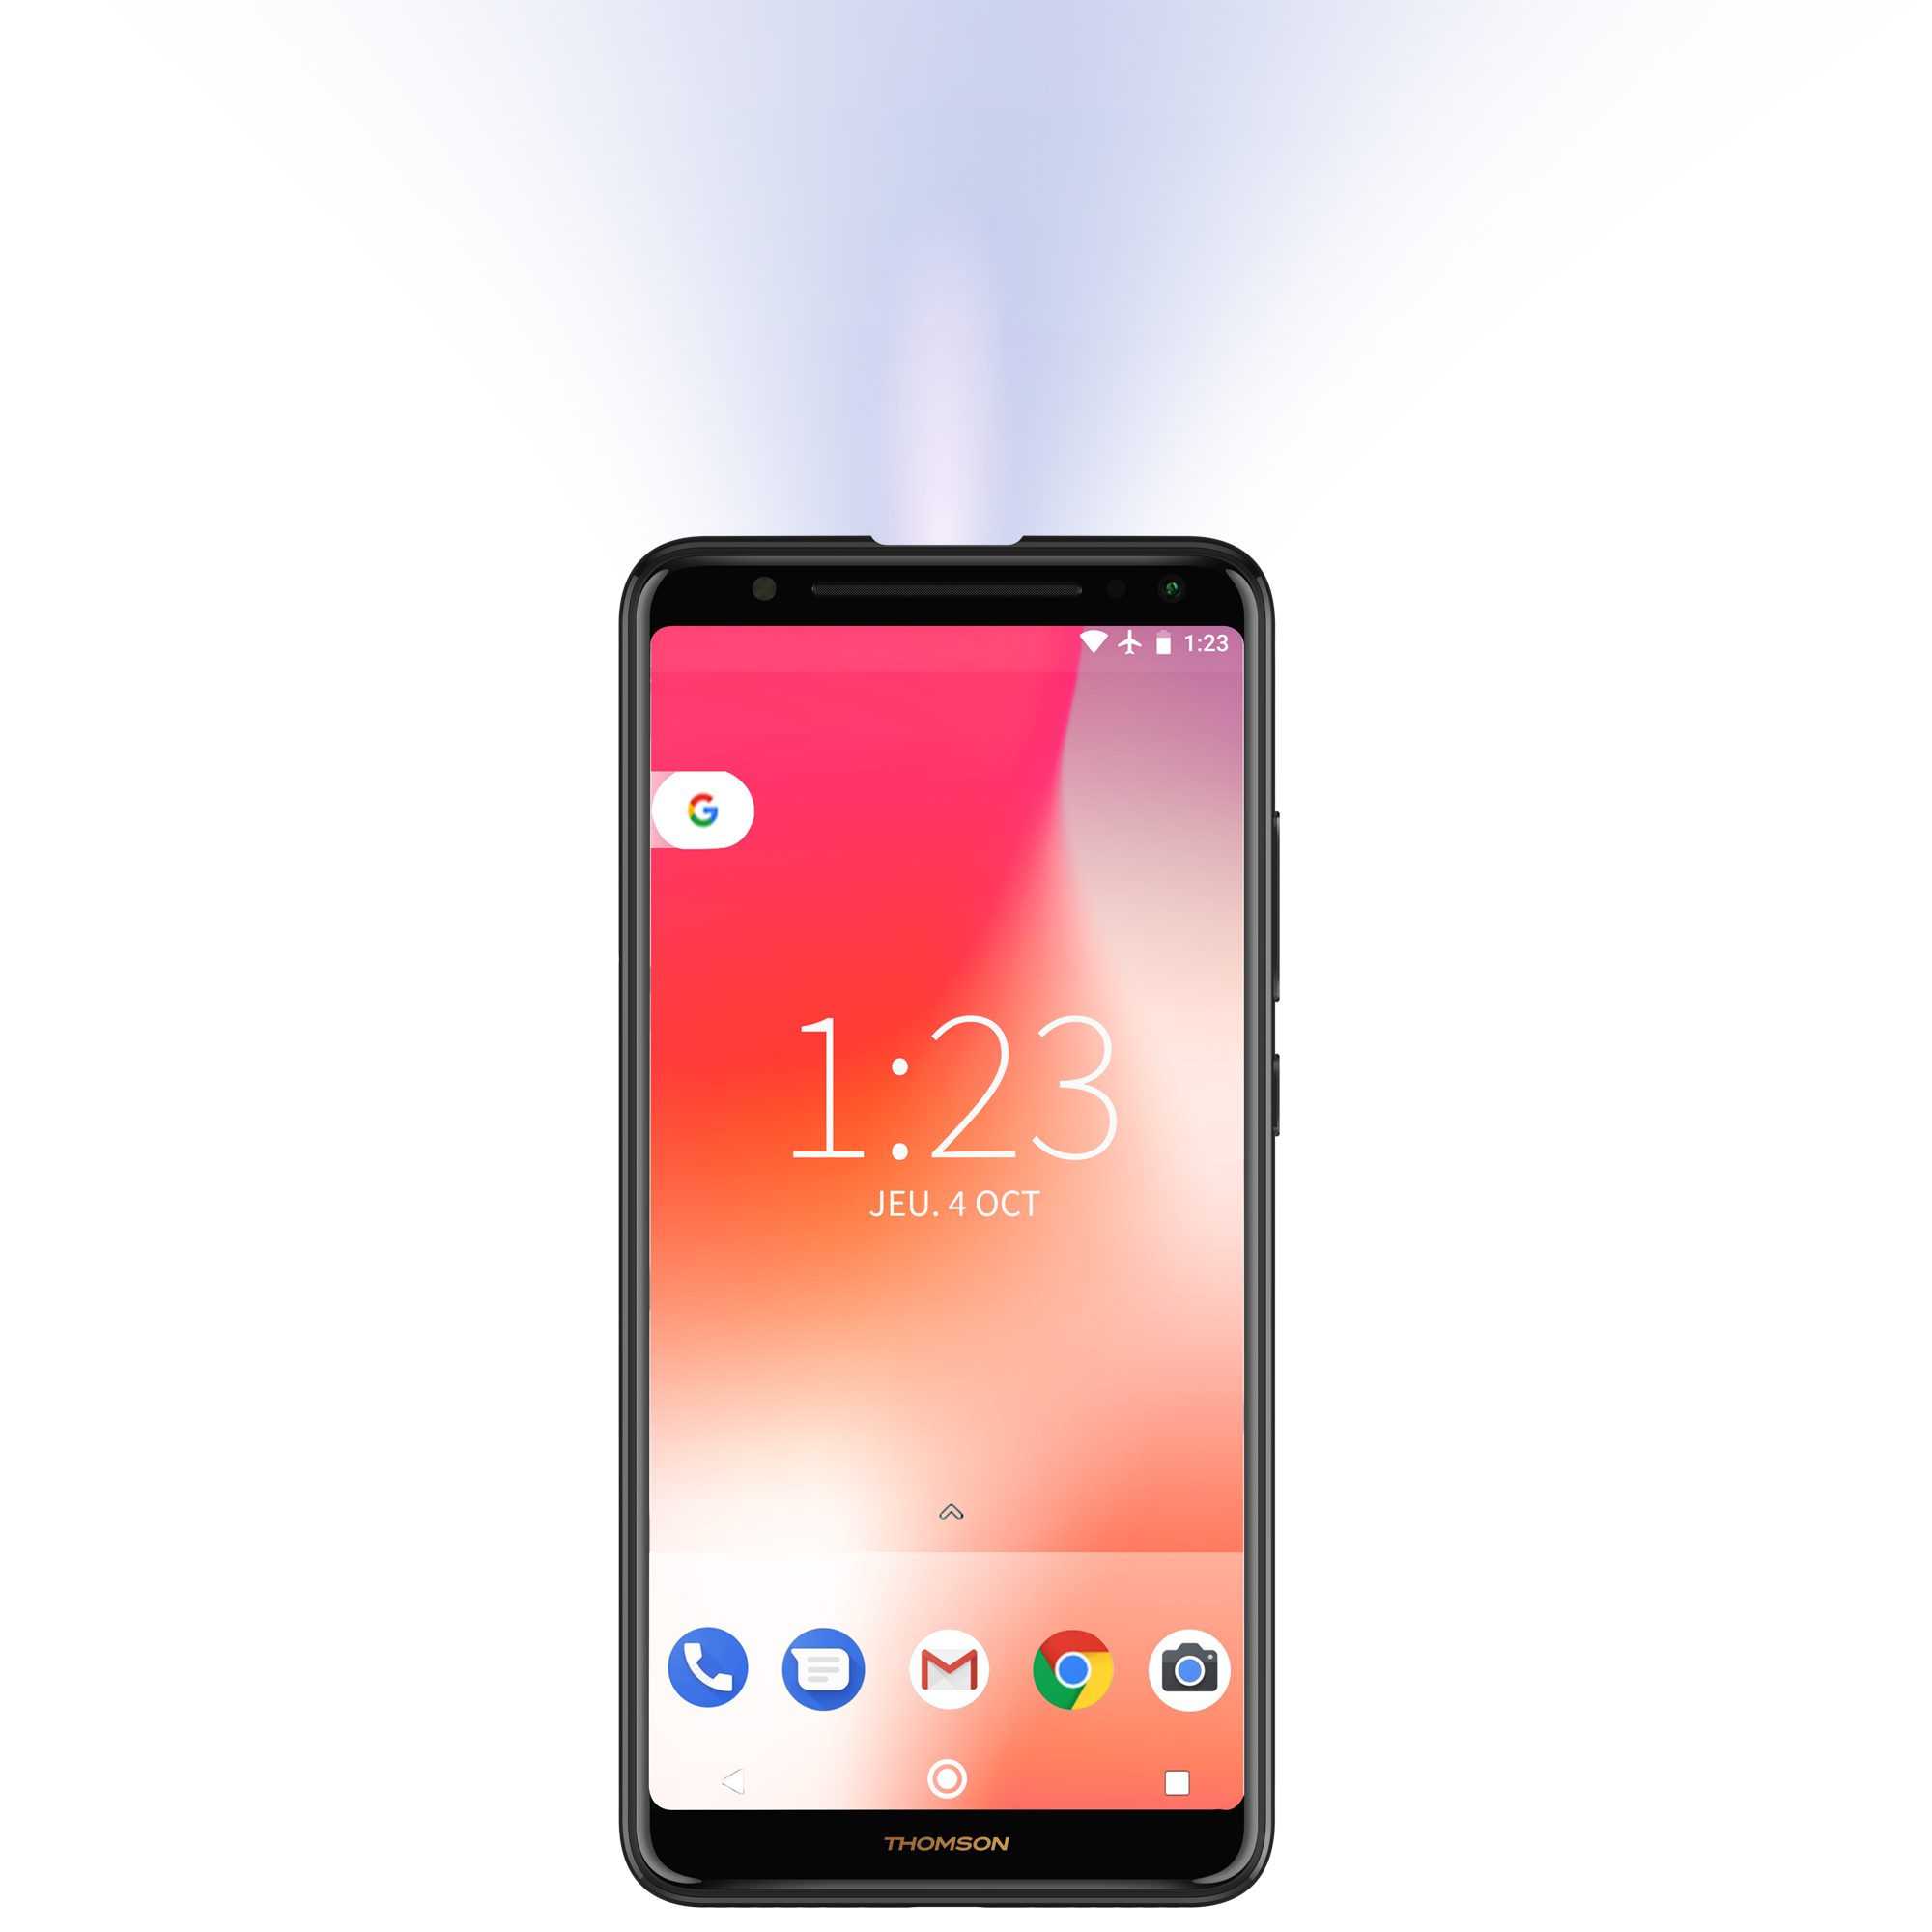 thomson v-6004G smartphone